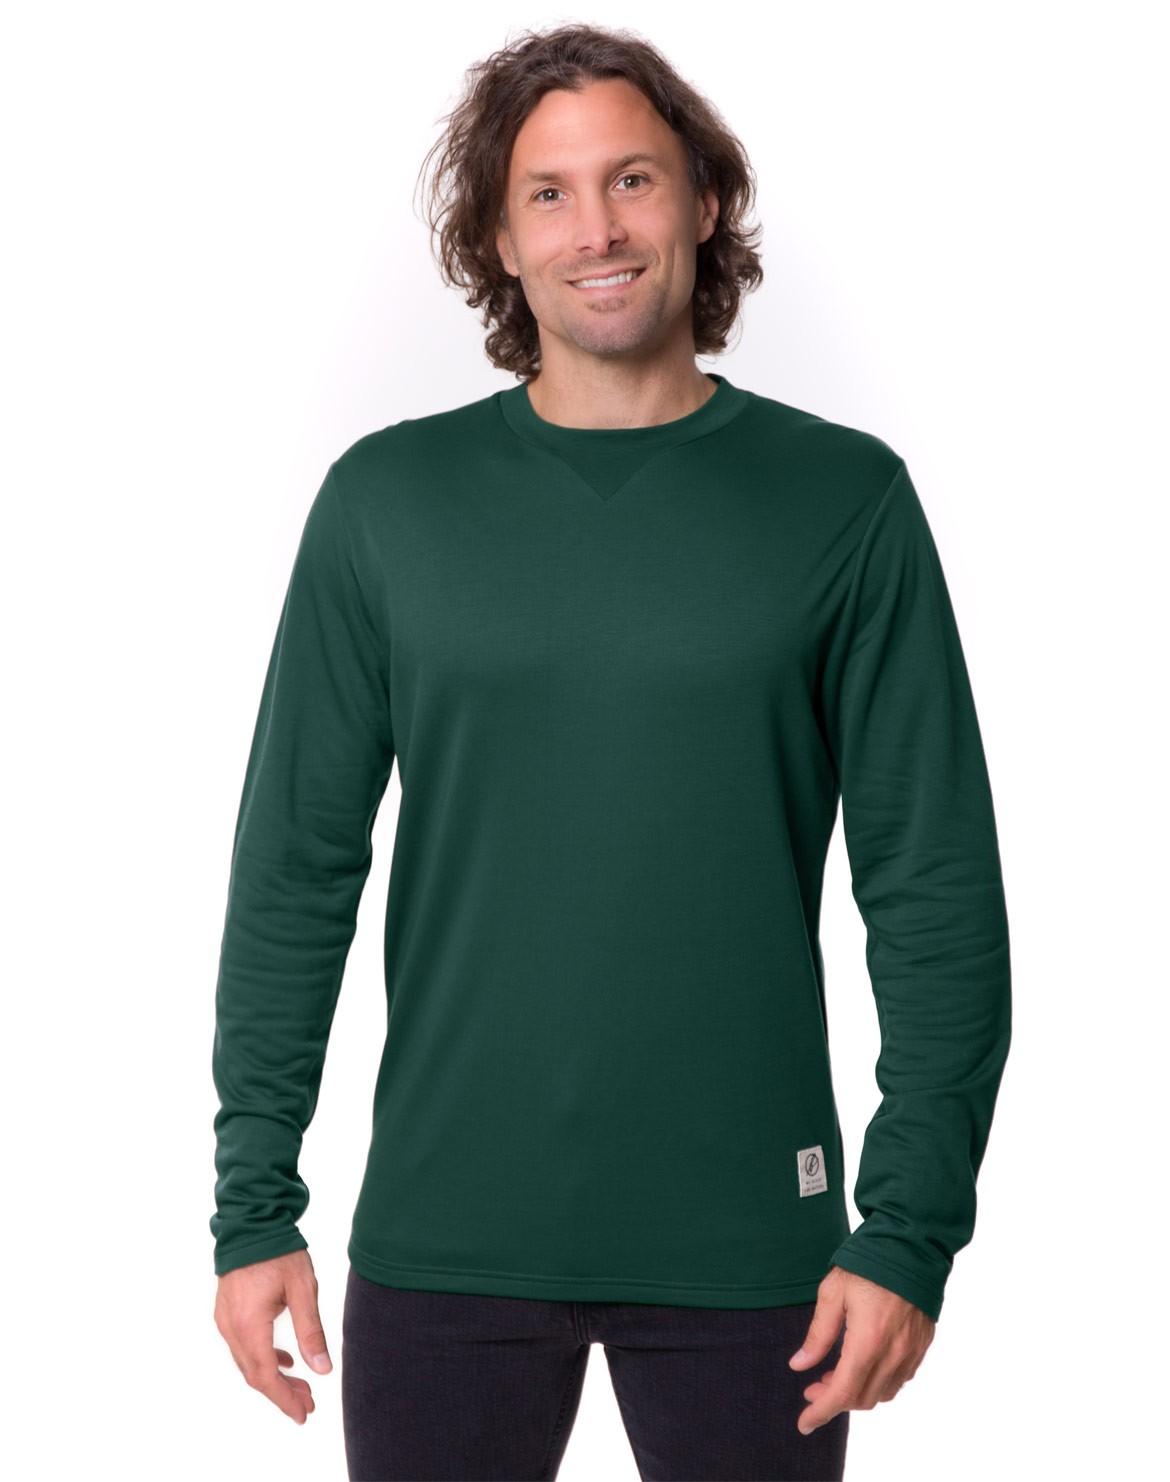 Super Active Sweater